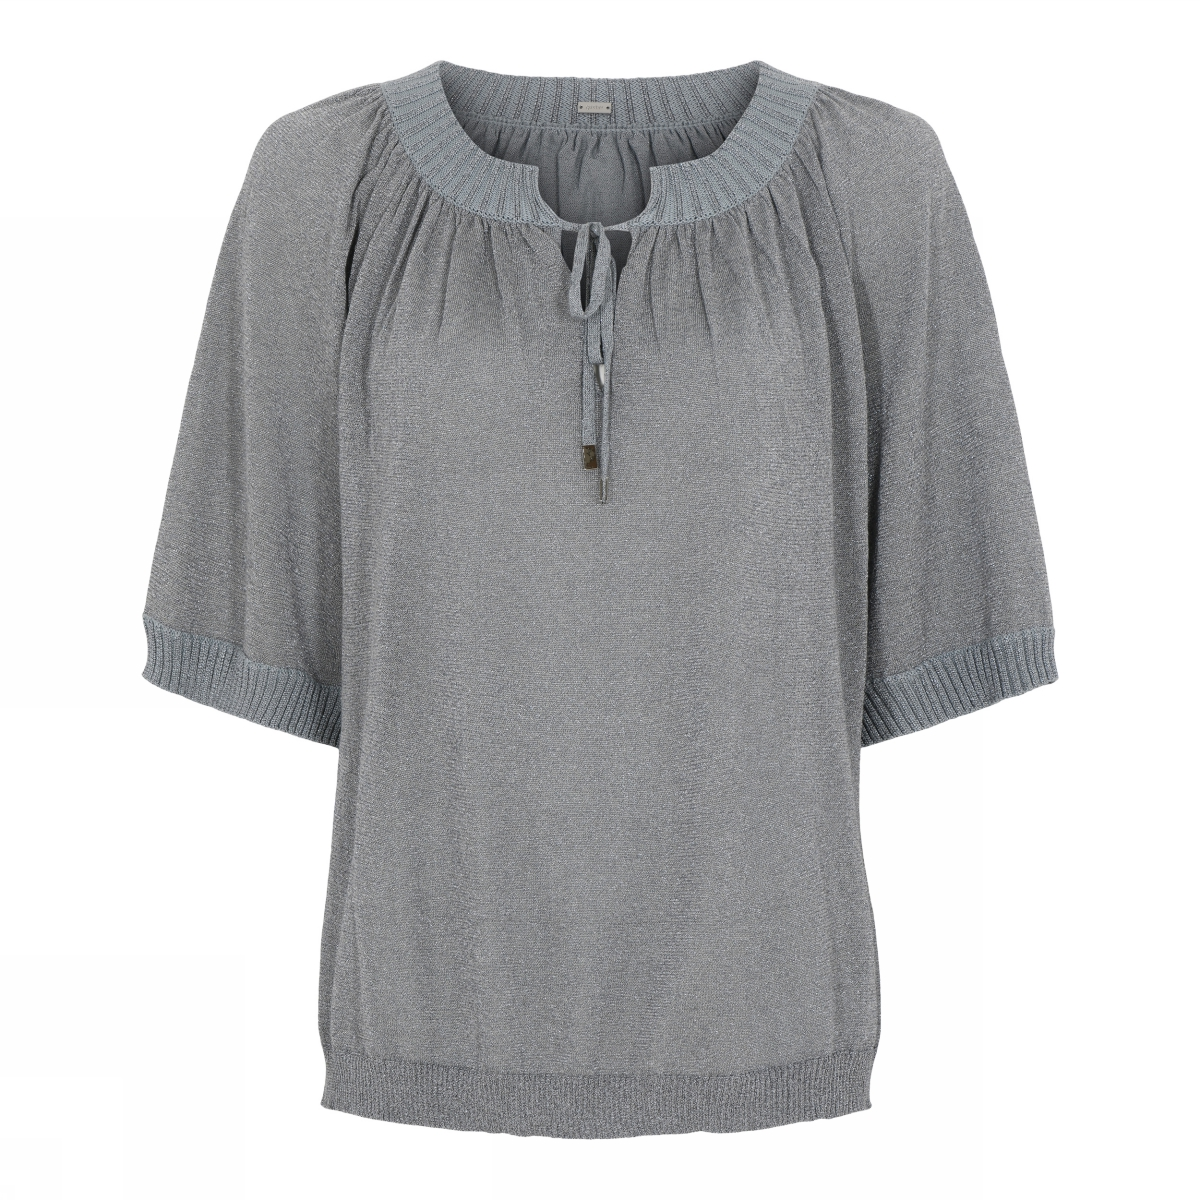 Dames top Gustav Jazzy a-shape knit   41404-3537-0-94026